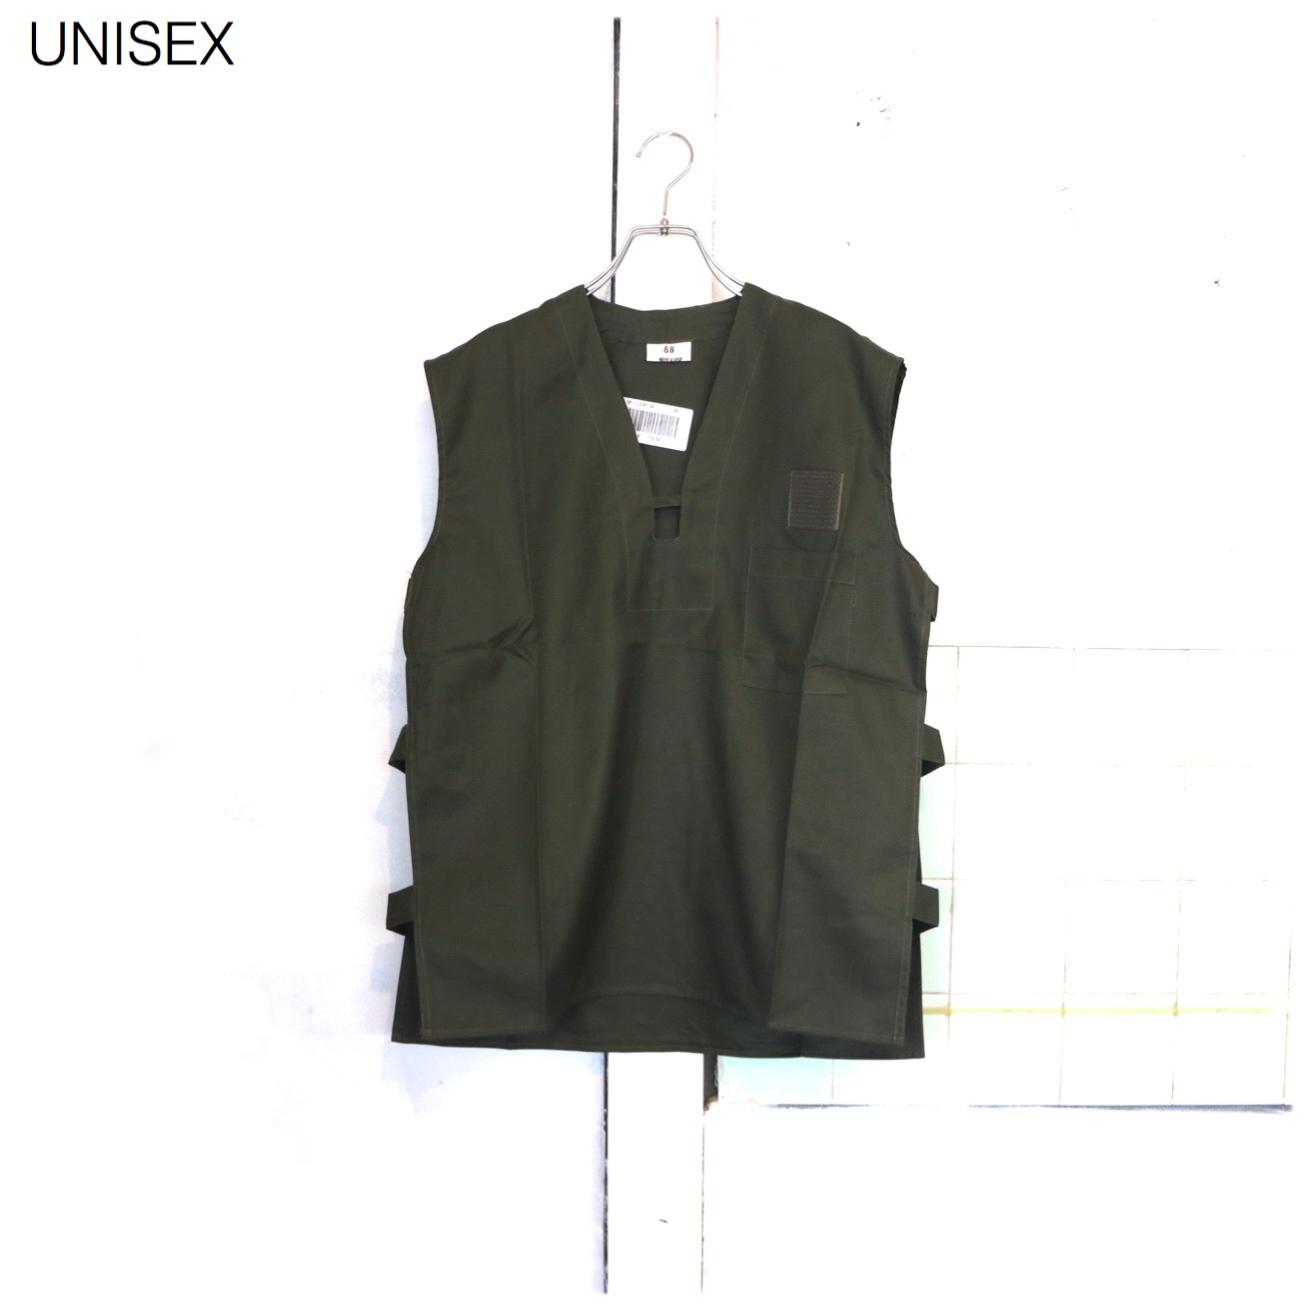 【DEADSTOCK UNISEX】80s FRENCH ARMY VEST_d0000298_11522340.jpg